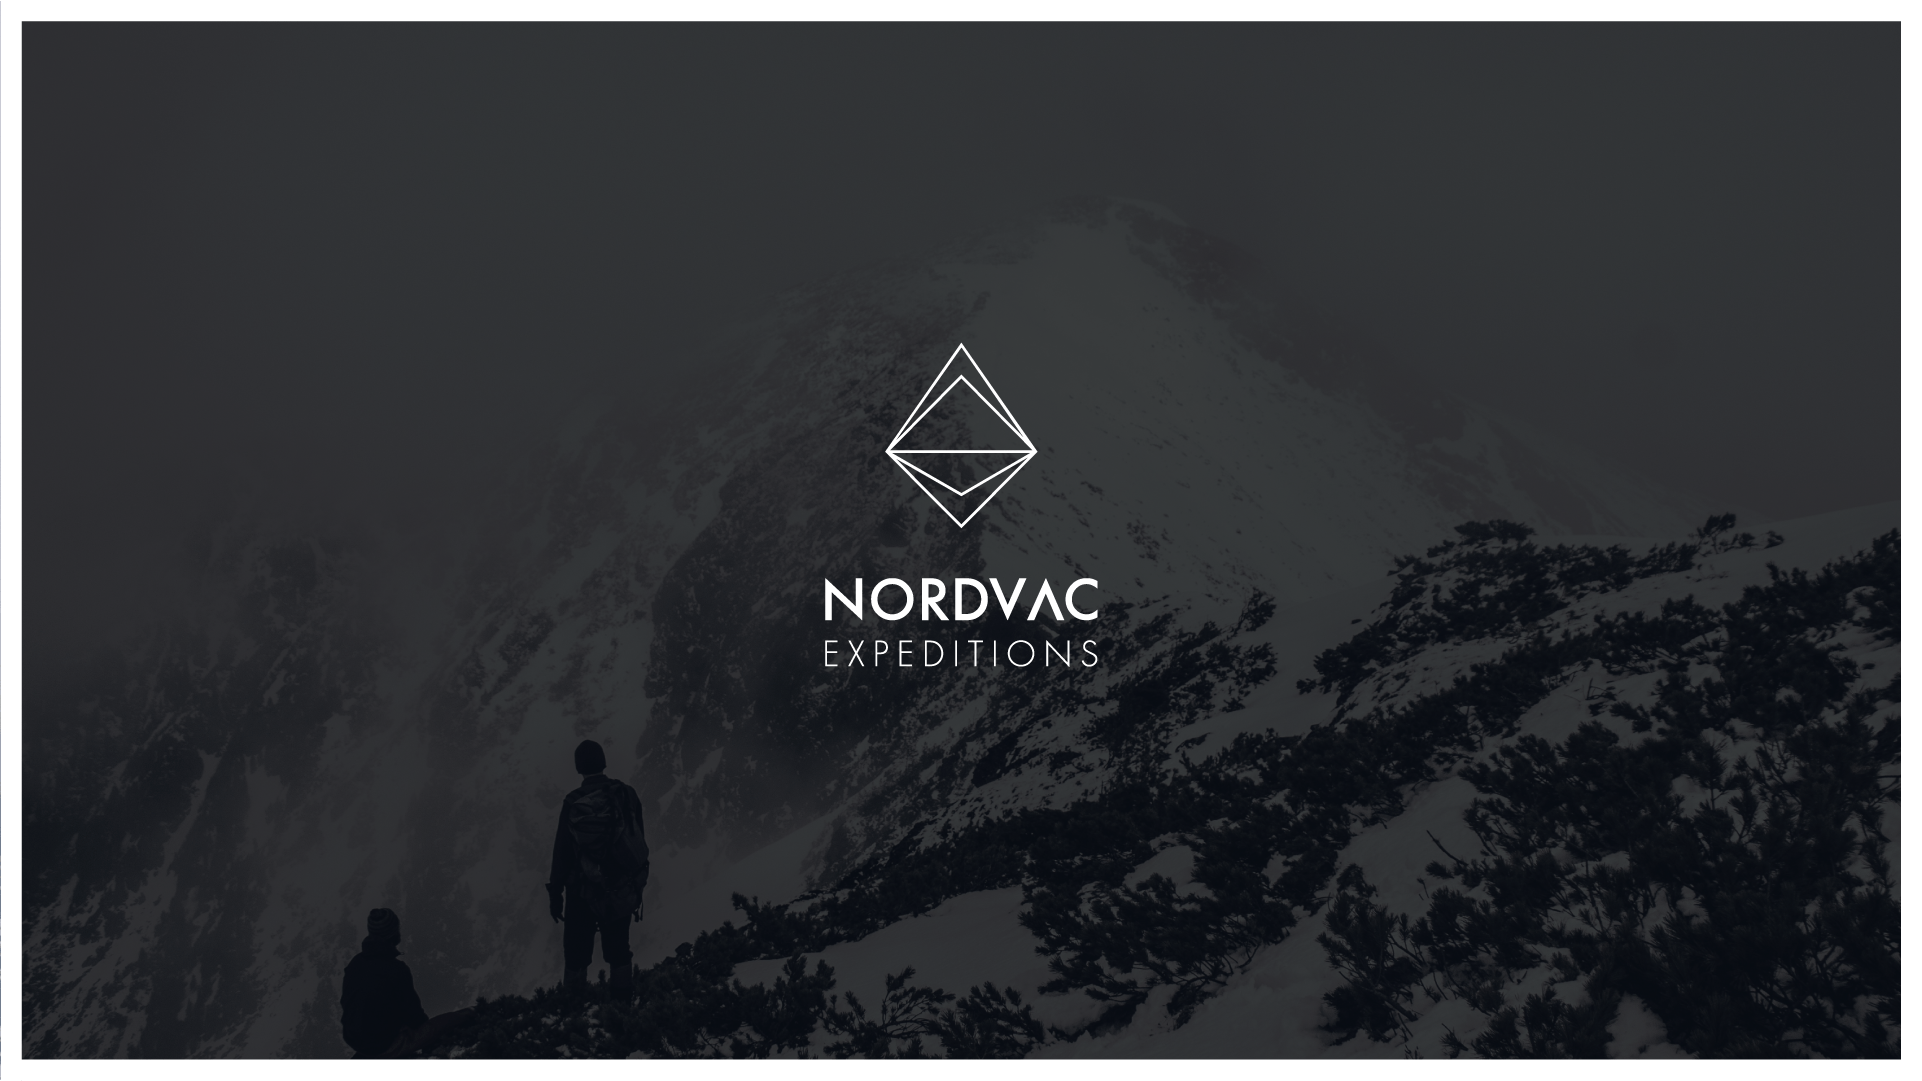 nordvac-1